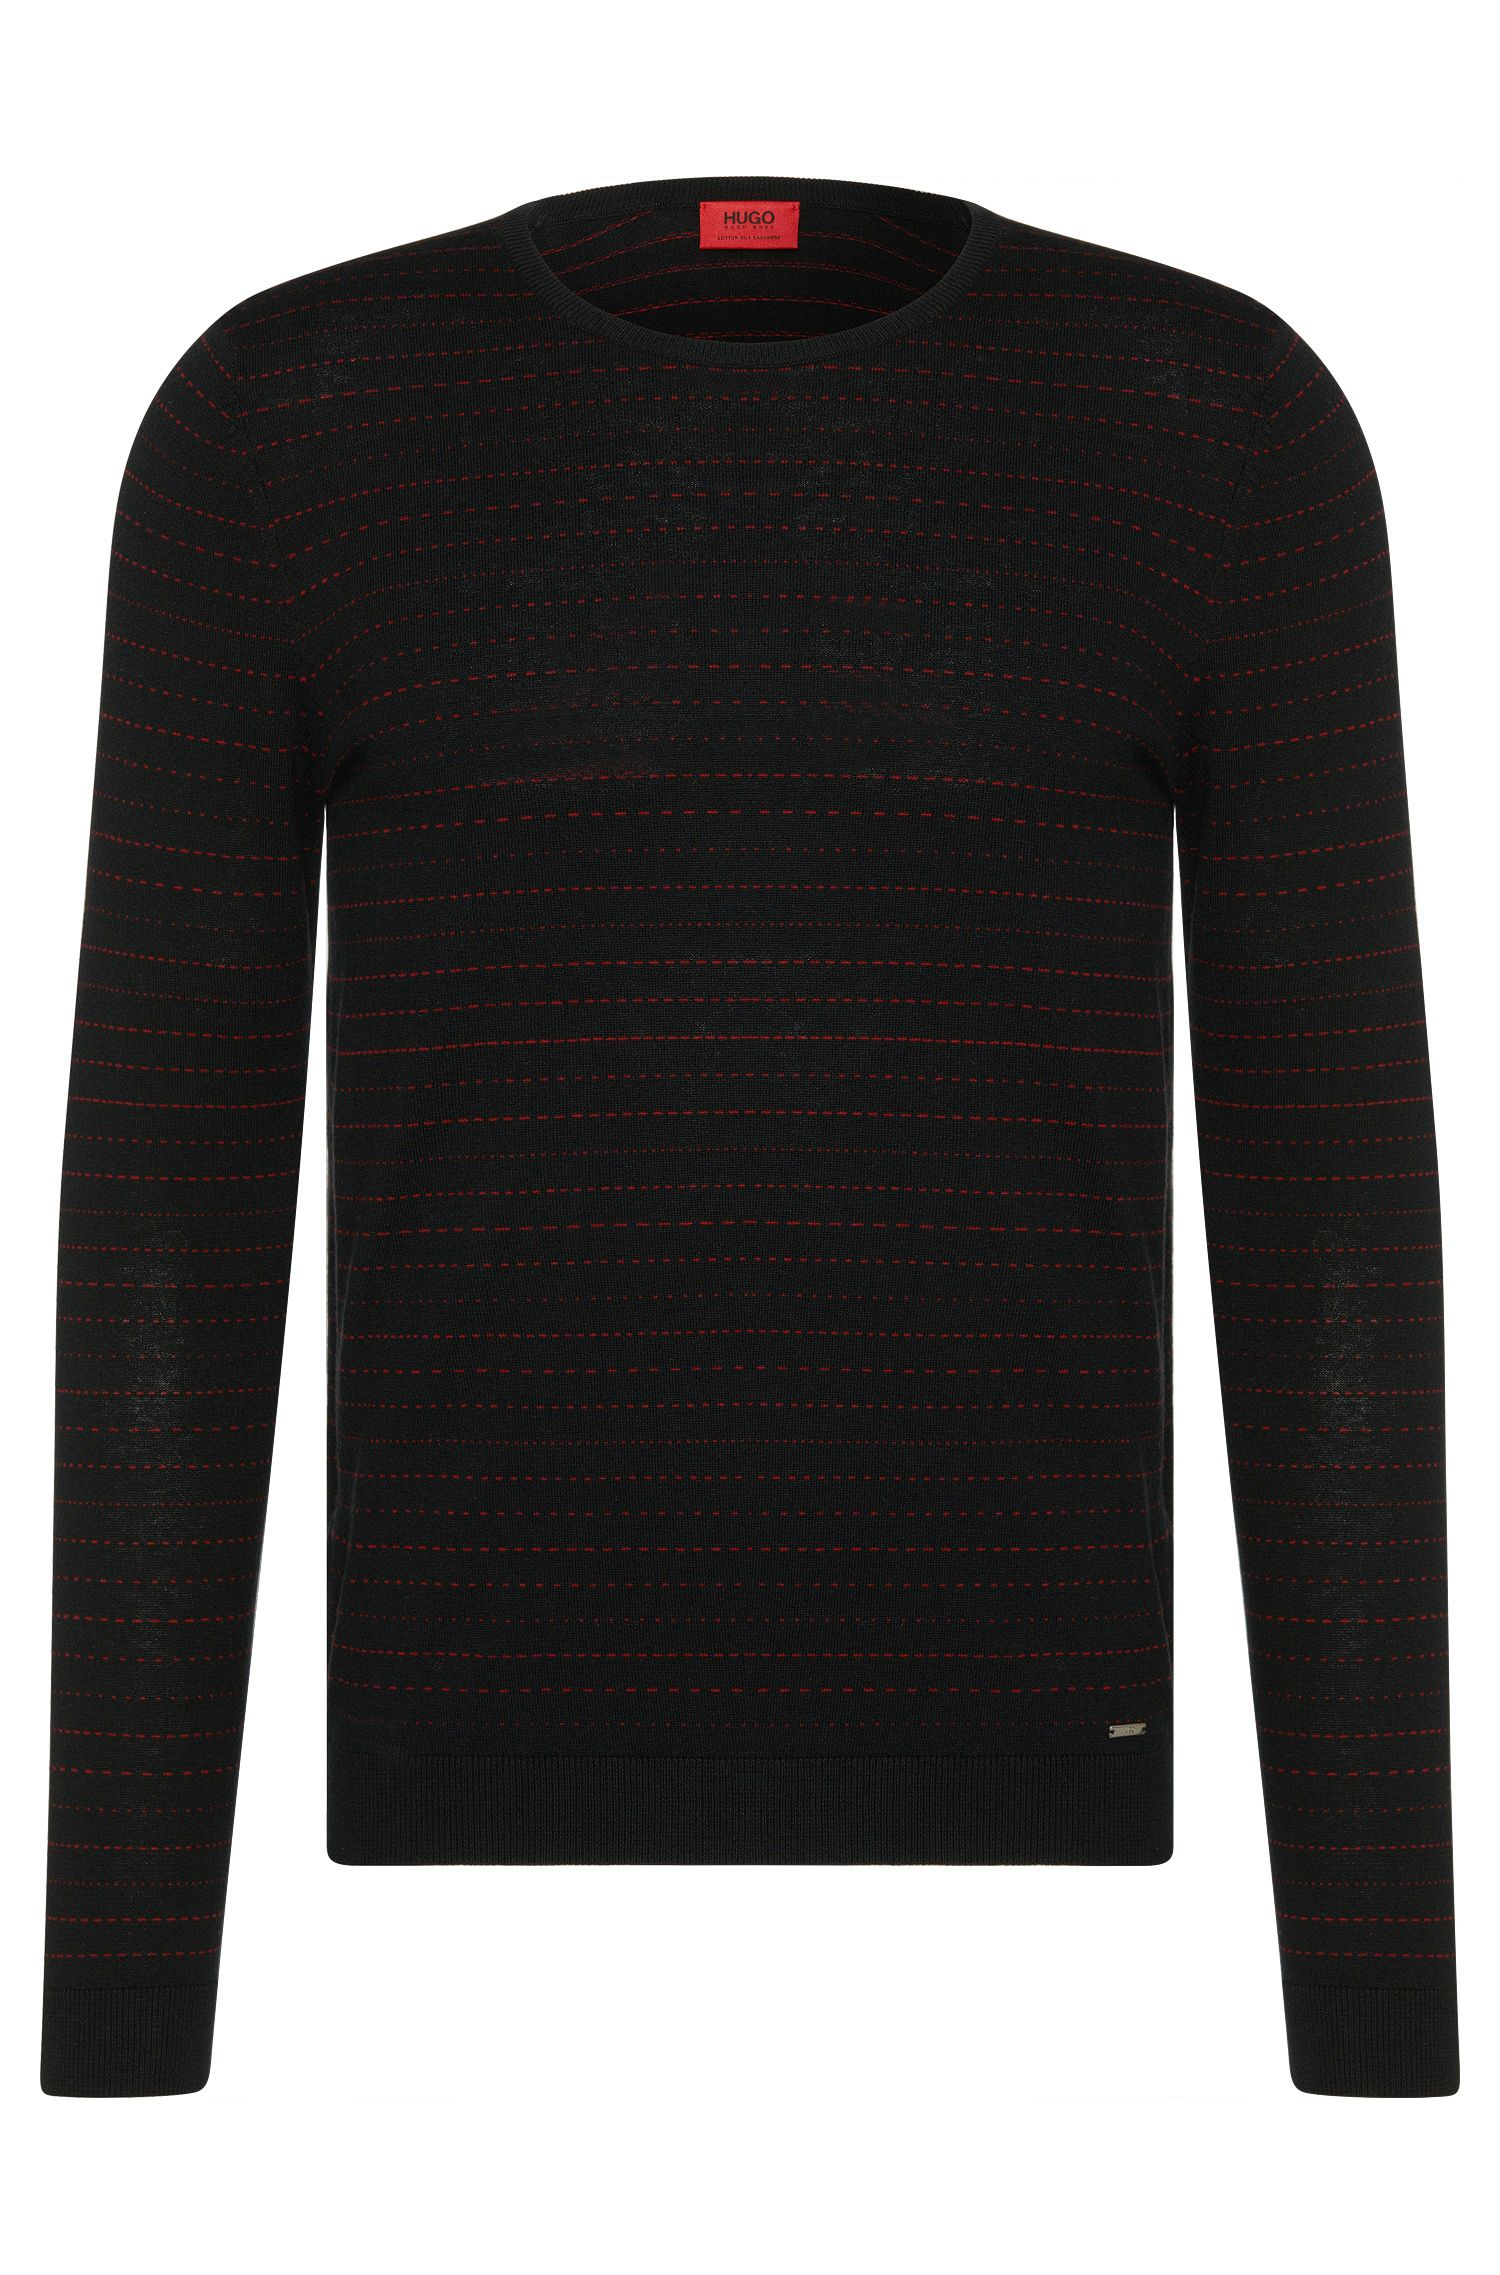 'Samf' | Cotton Silk Cashmere Sweater